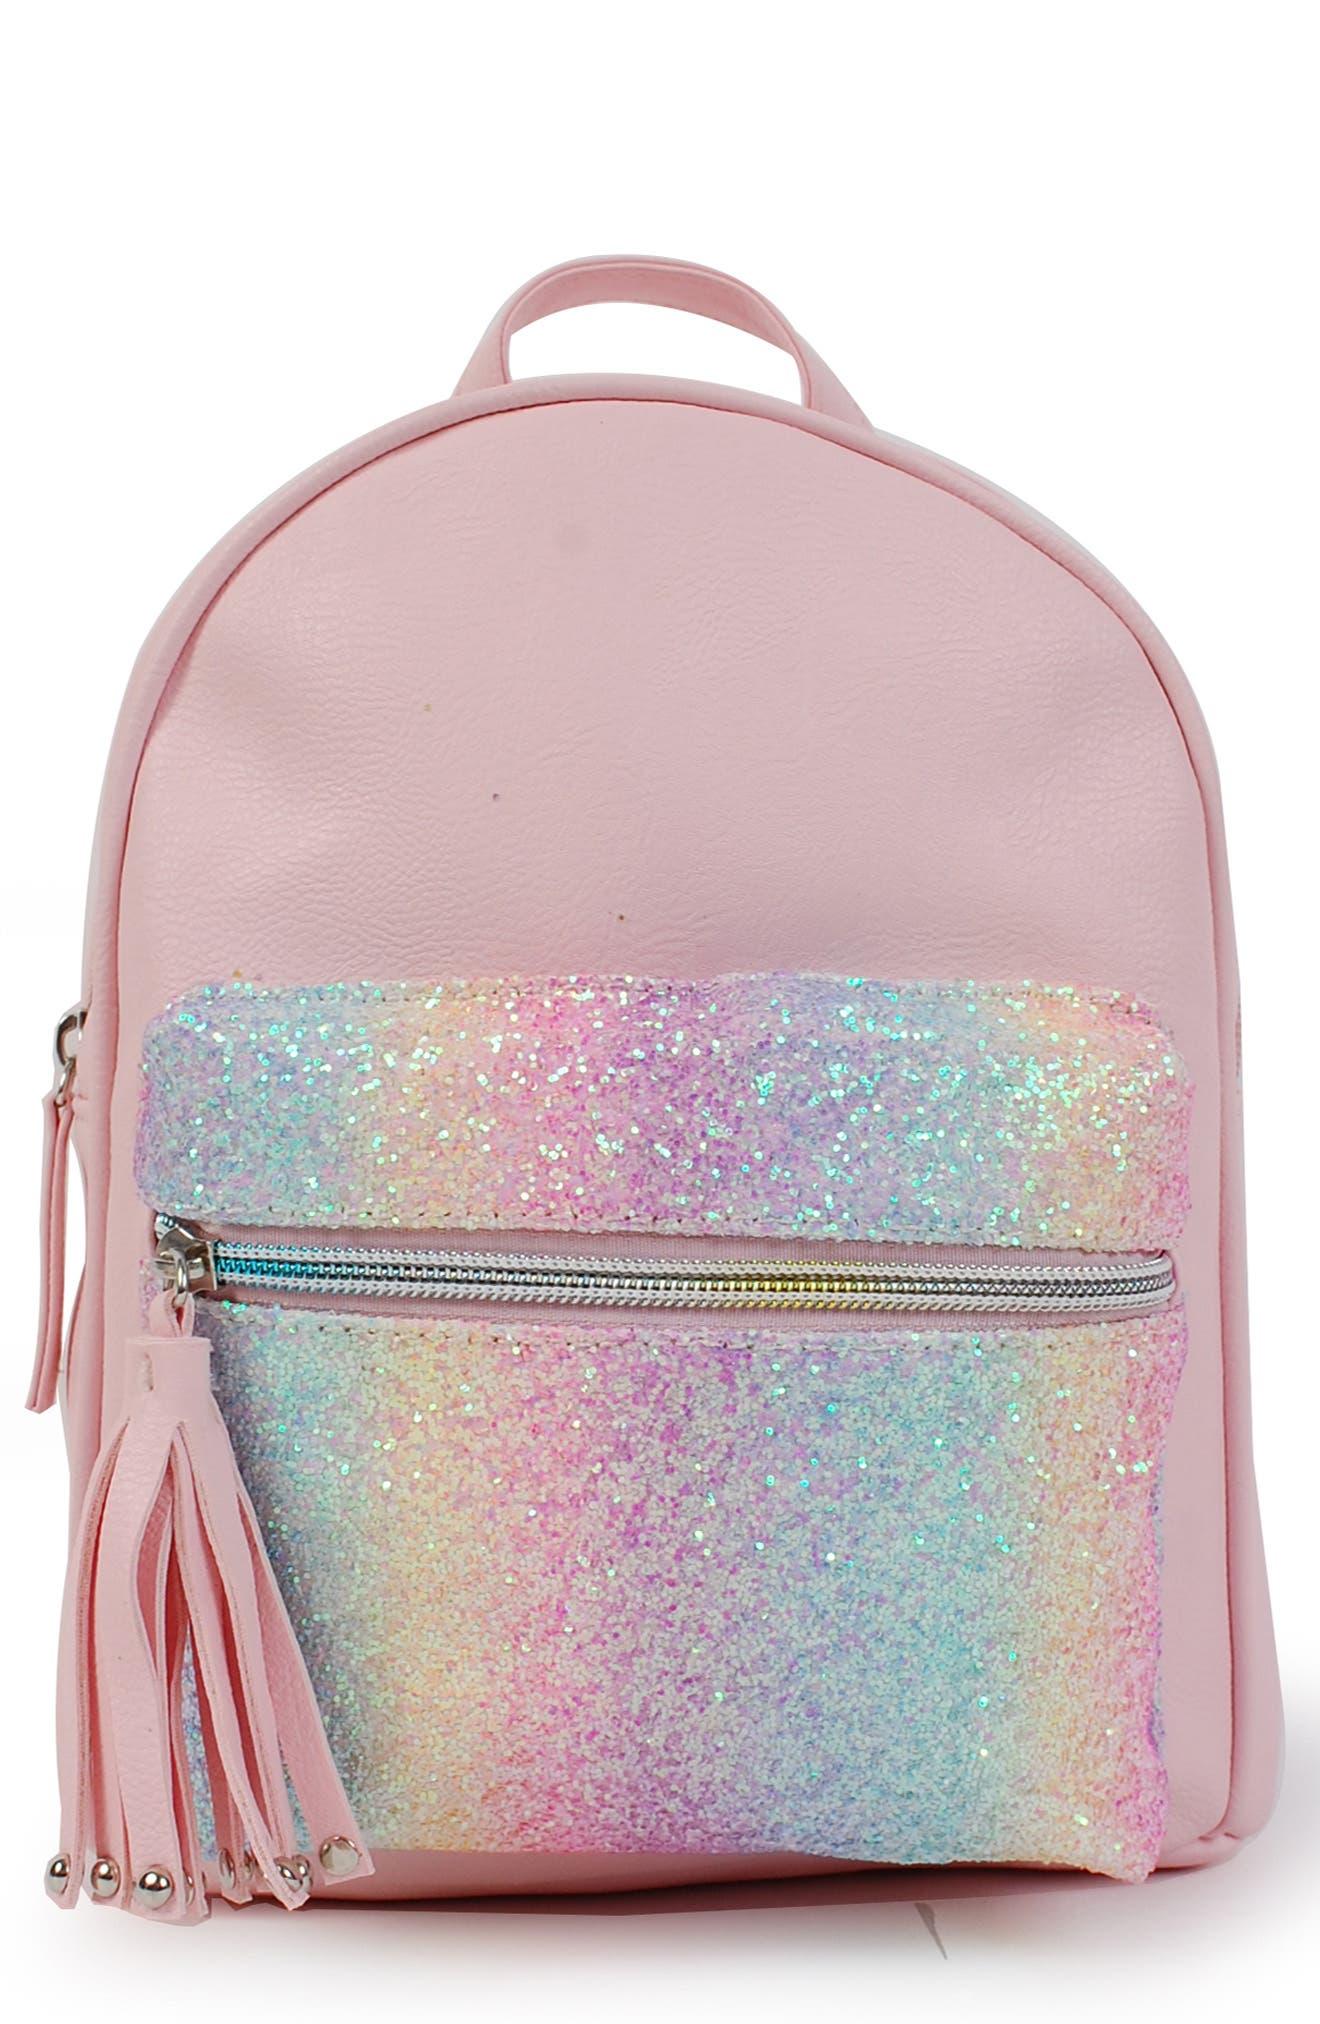 Rainbow Glitter Mini Backpack,                             Main thumbnail 1, color,                             PINK